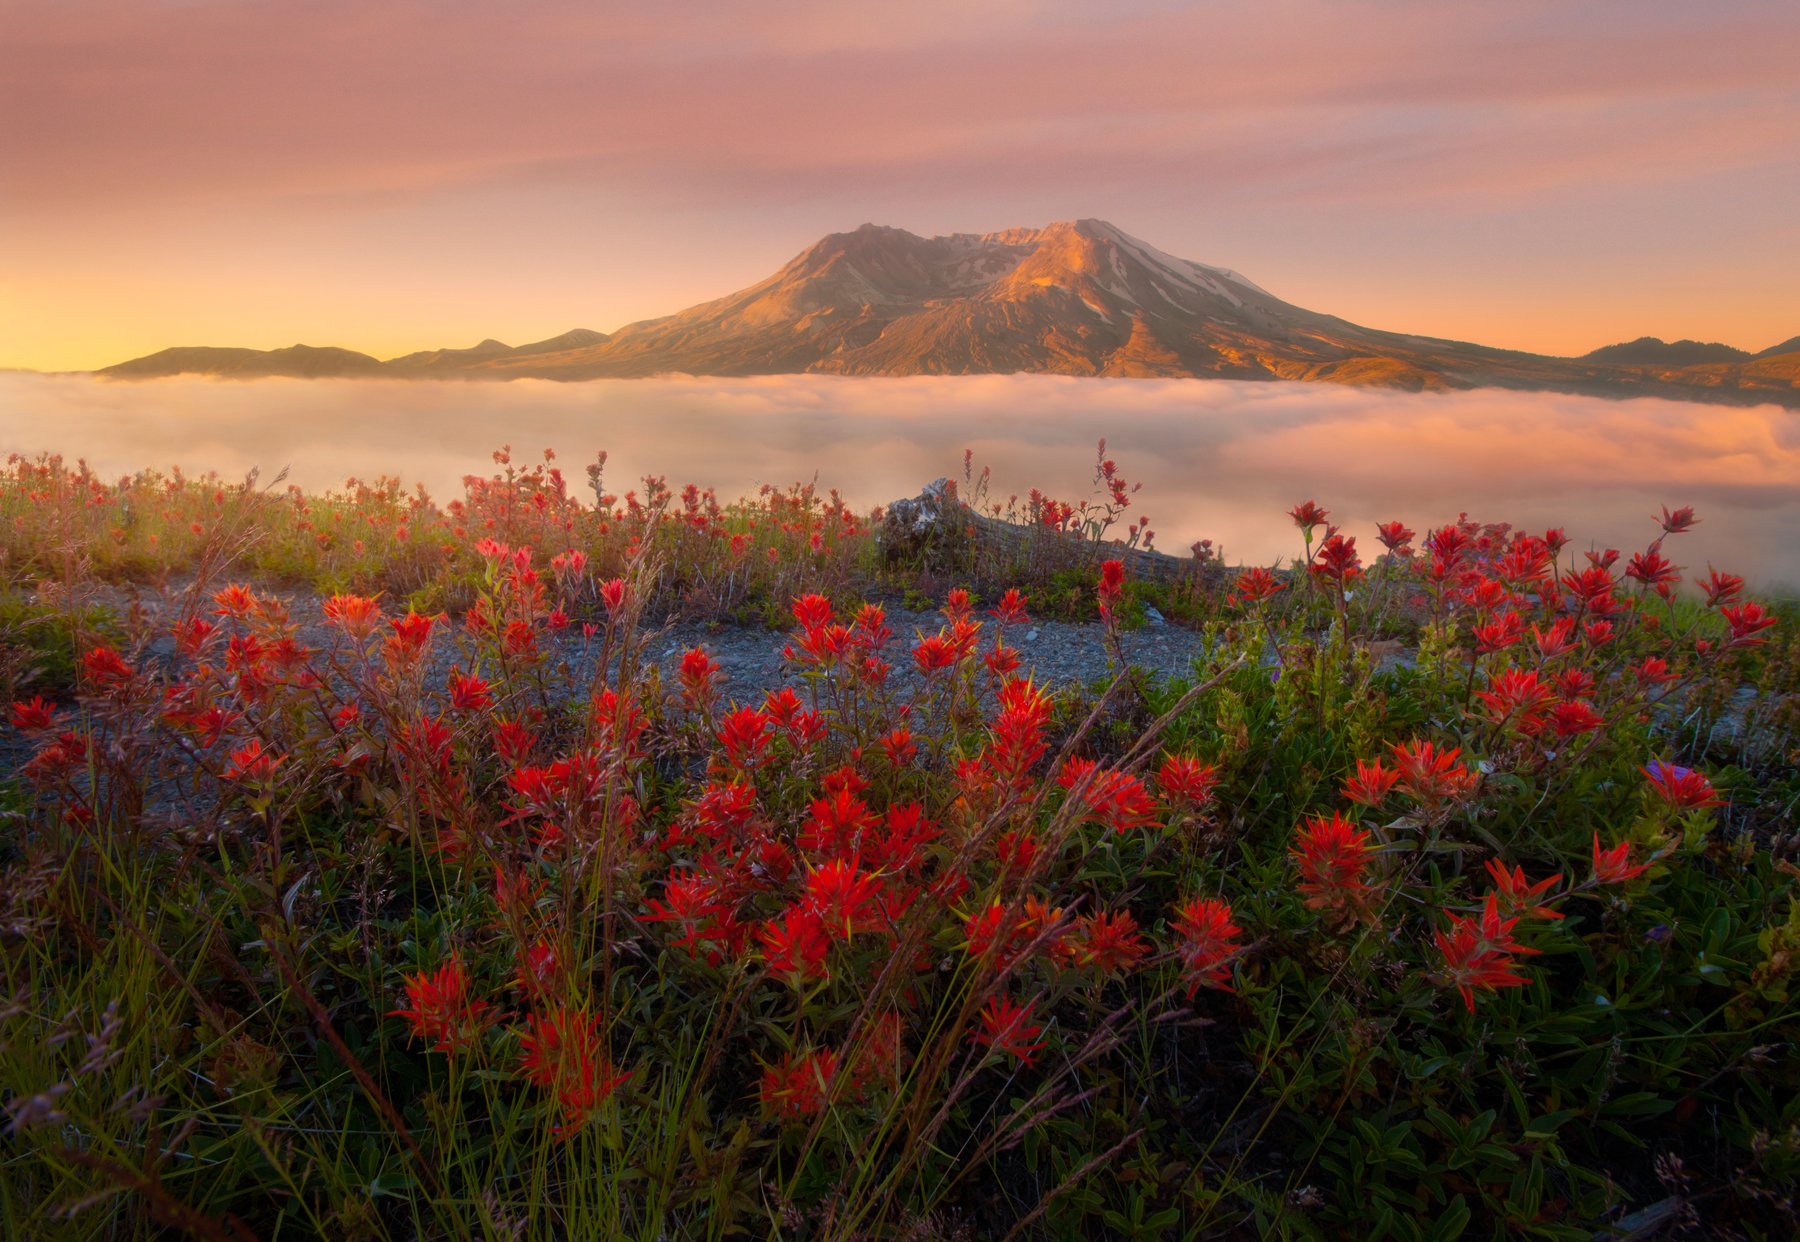 Mt+St+Helens+FINAL+Dark+-+FINA-2246990101-O.jpg